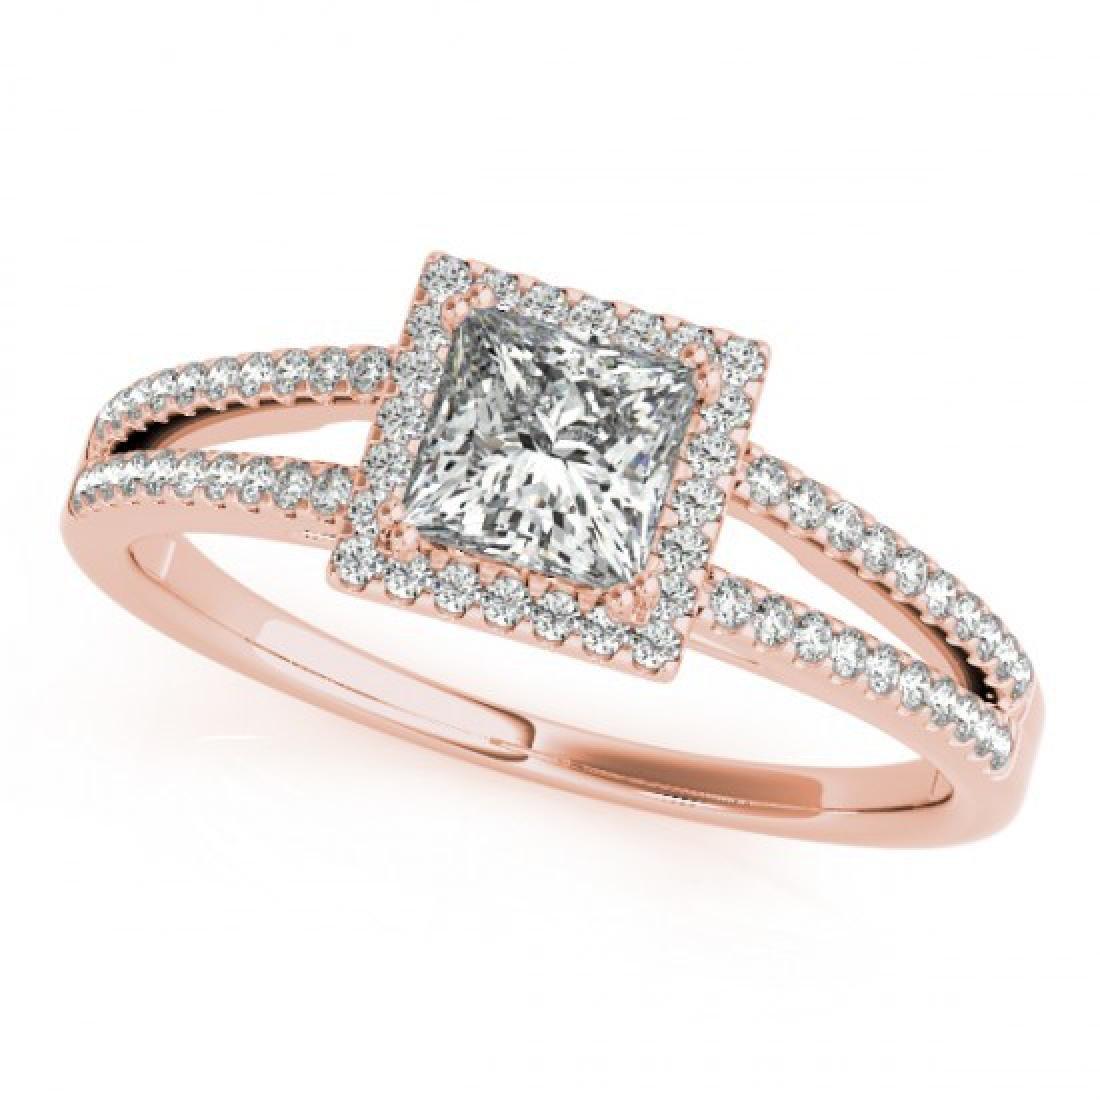 1.1 CTW Certified VS/SI Princess Diamond Solitaire Halo